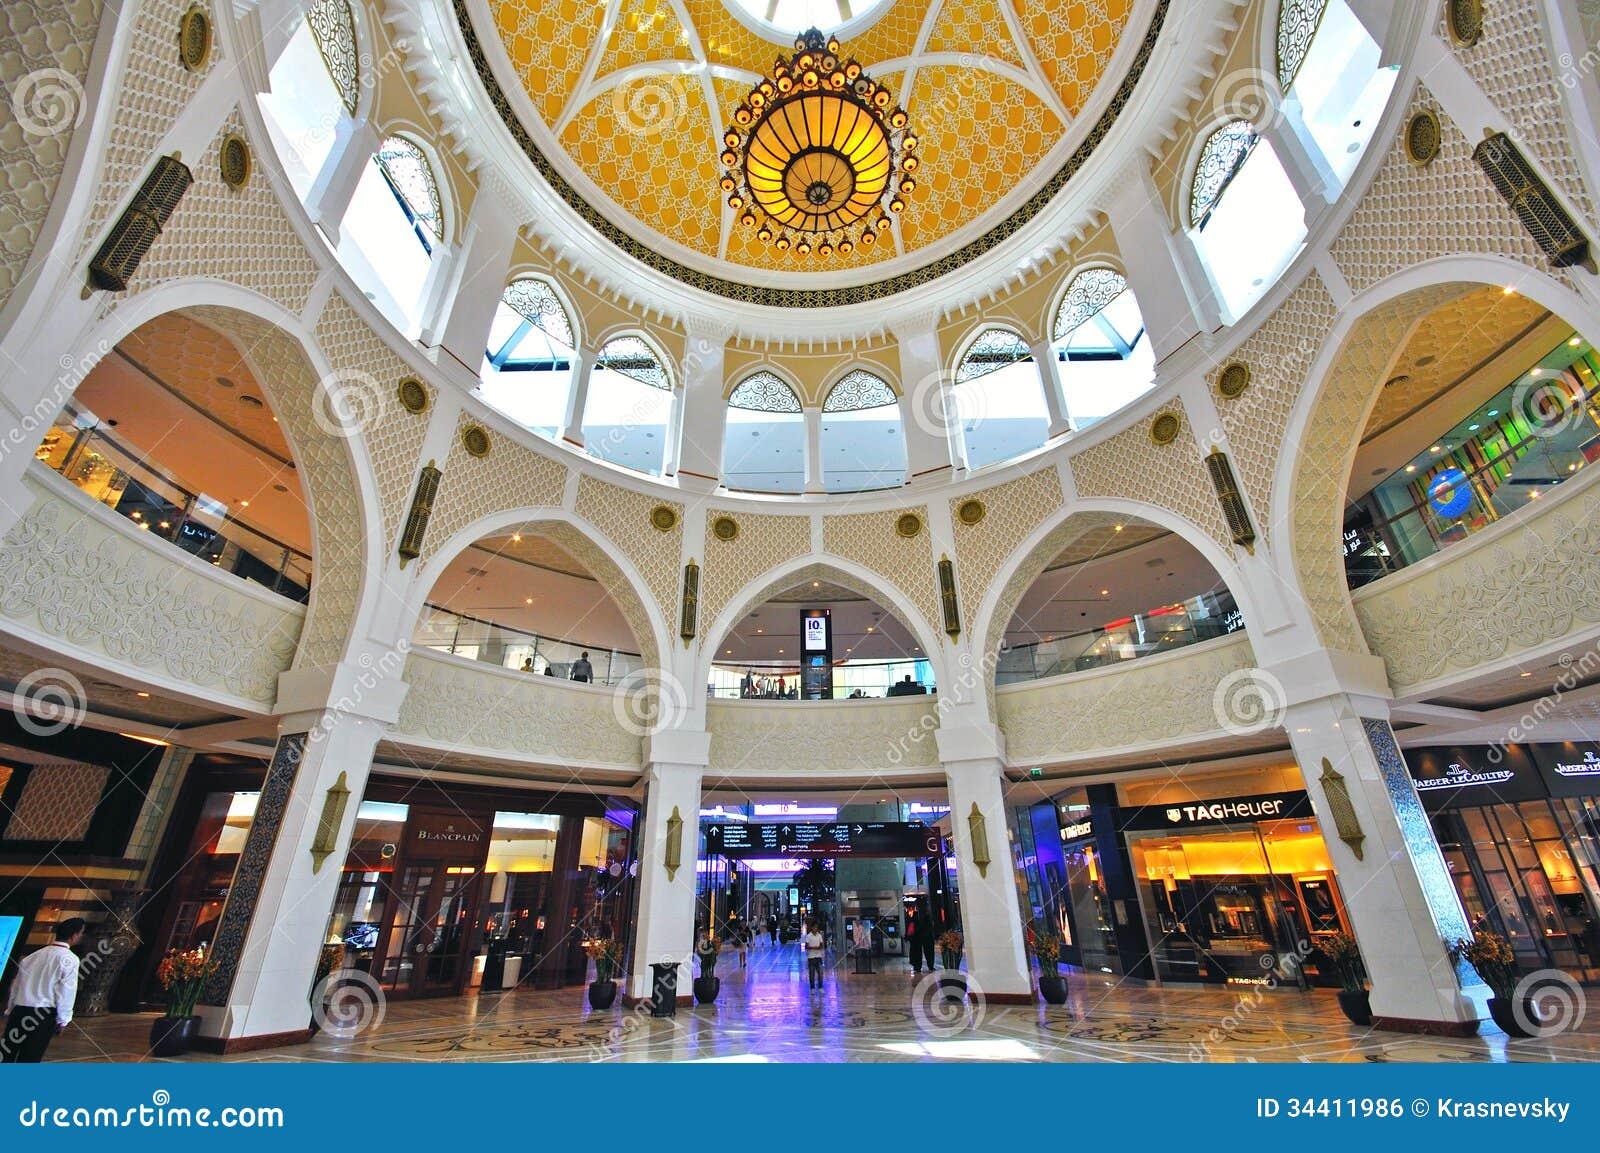 Dubai shopping mall online